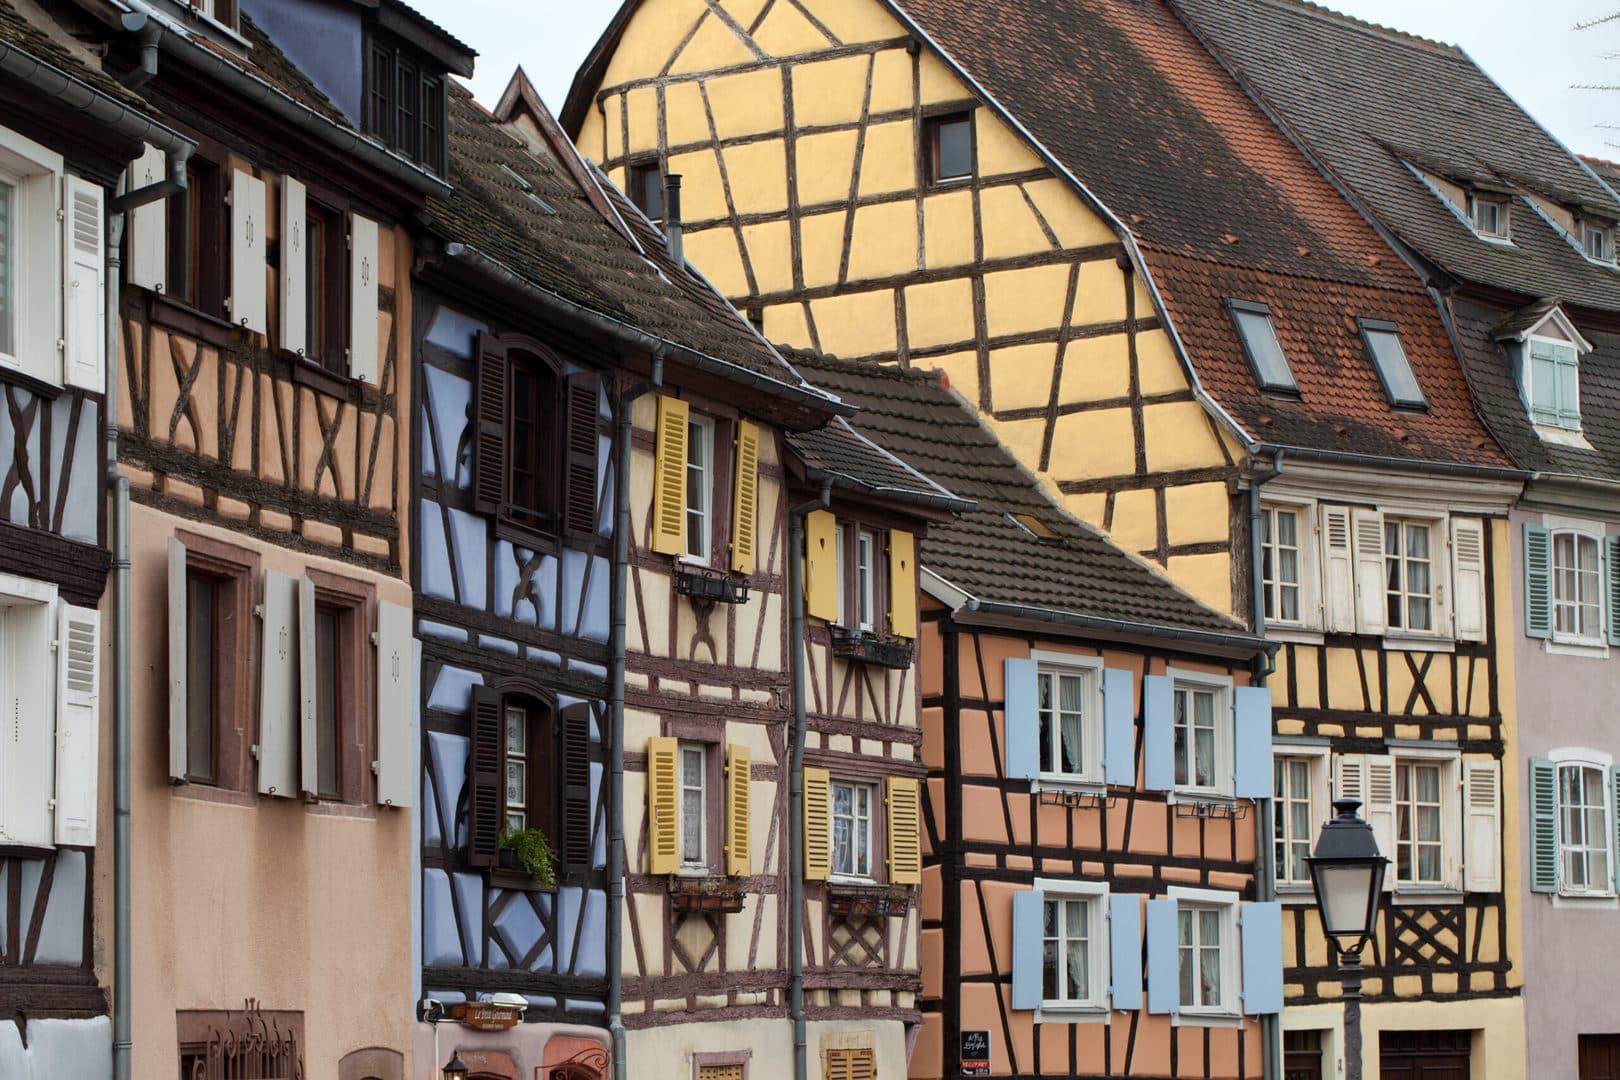 Studietur Strasbourg petitfrance